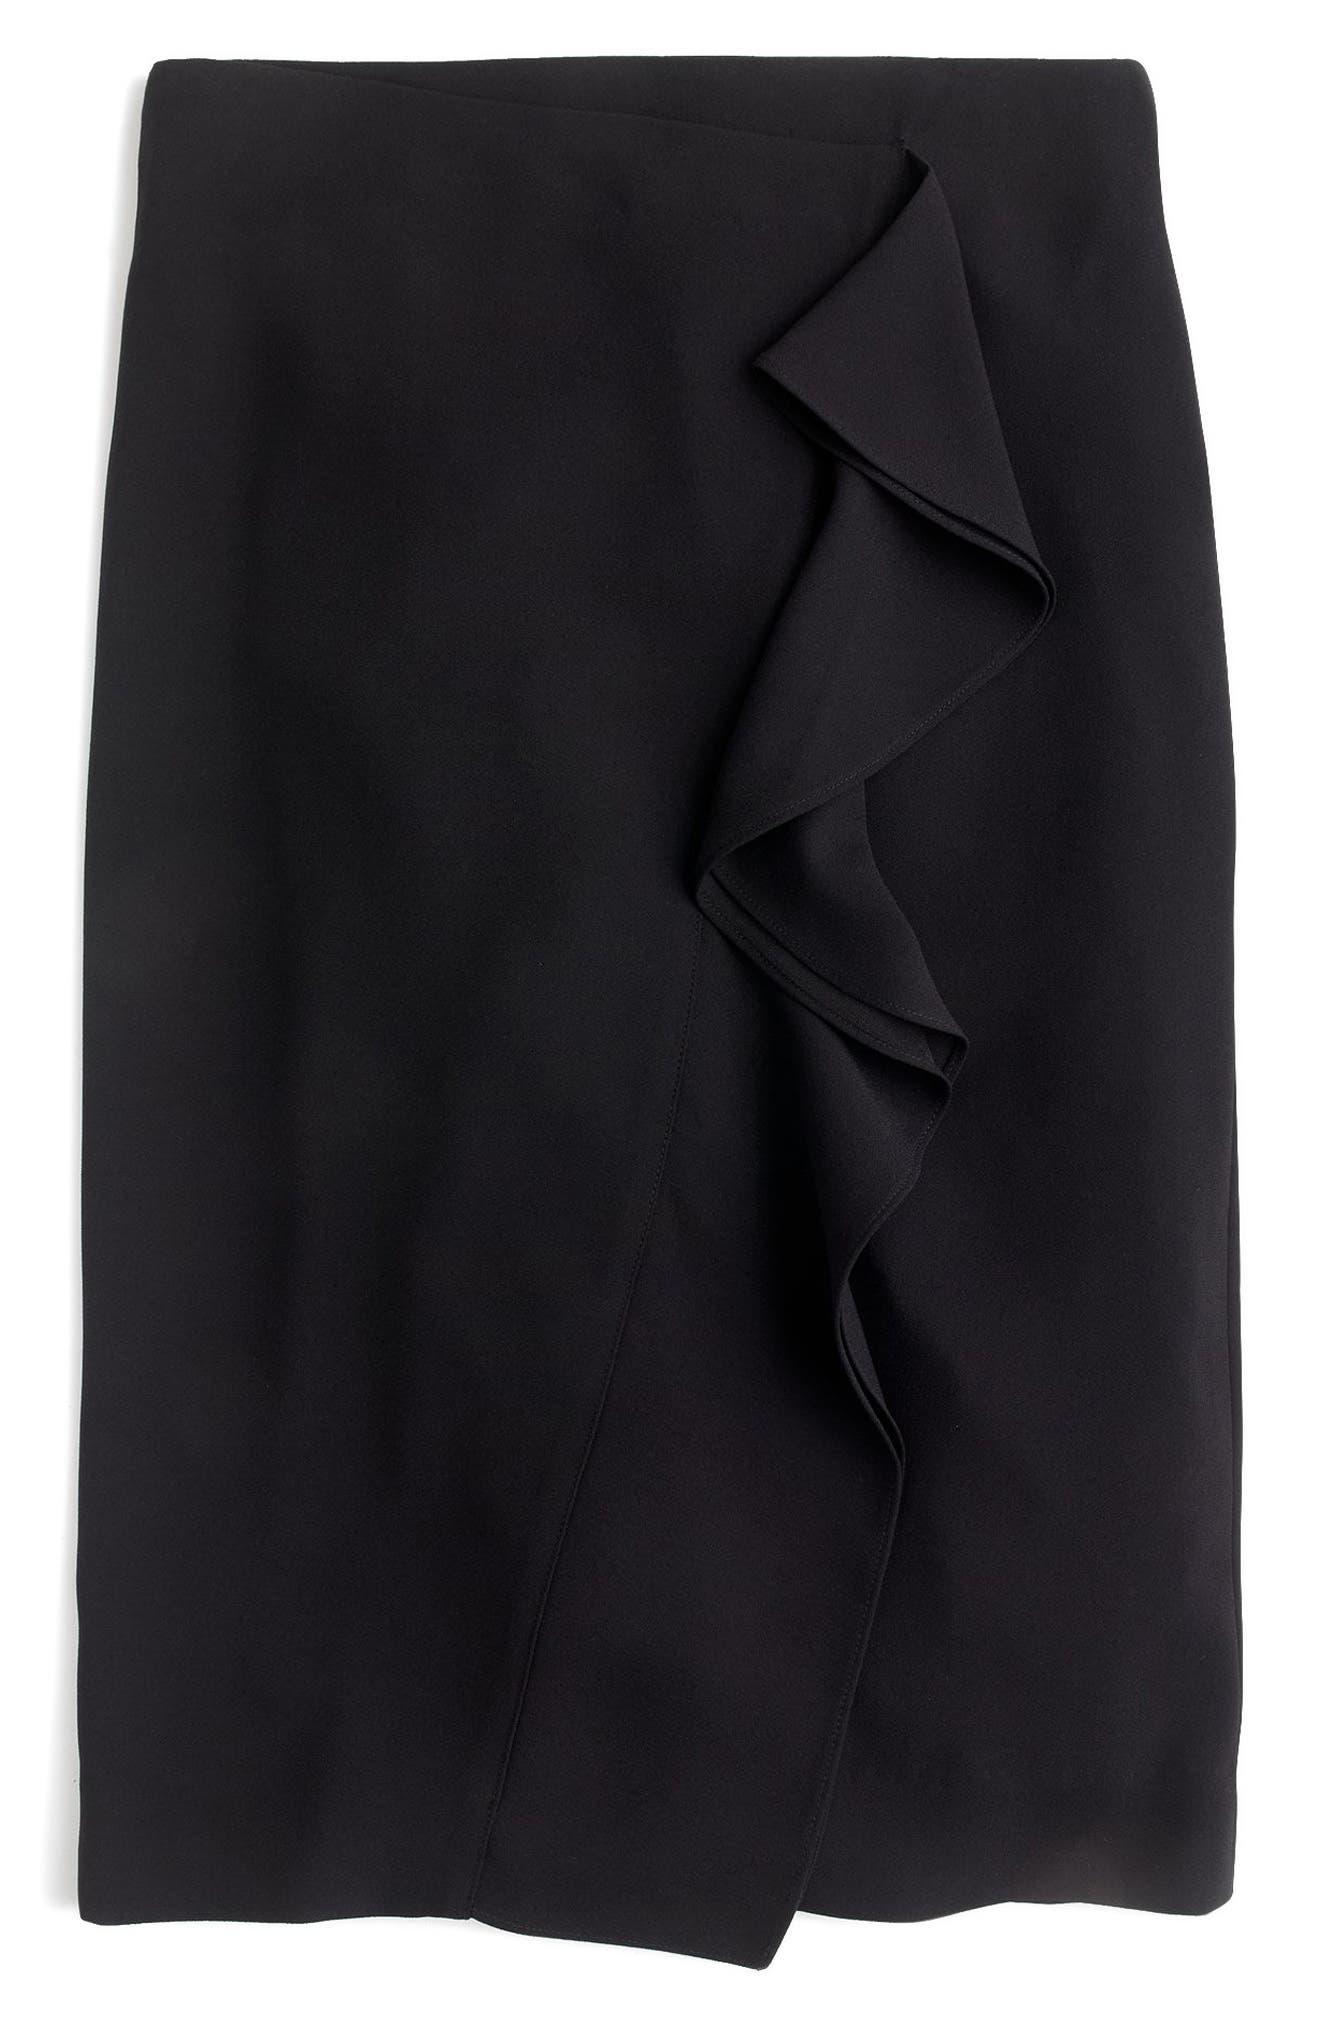 J.Crew 365 Crepe Ruffle Pencil Skirt